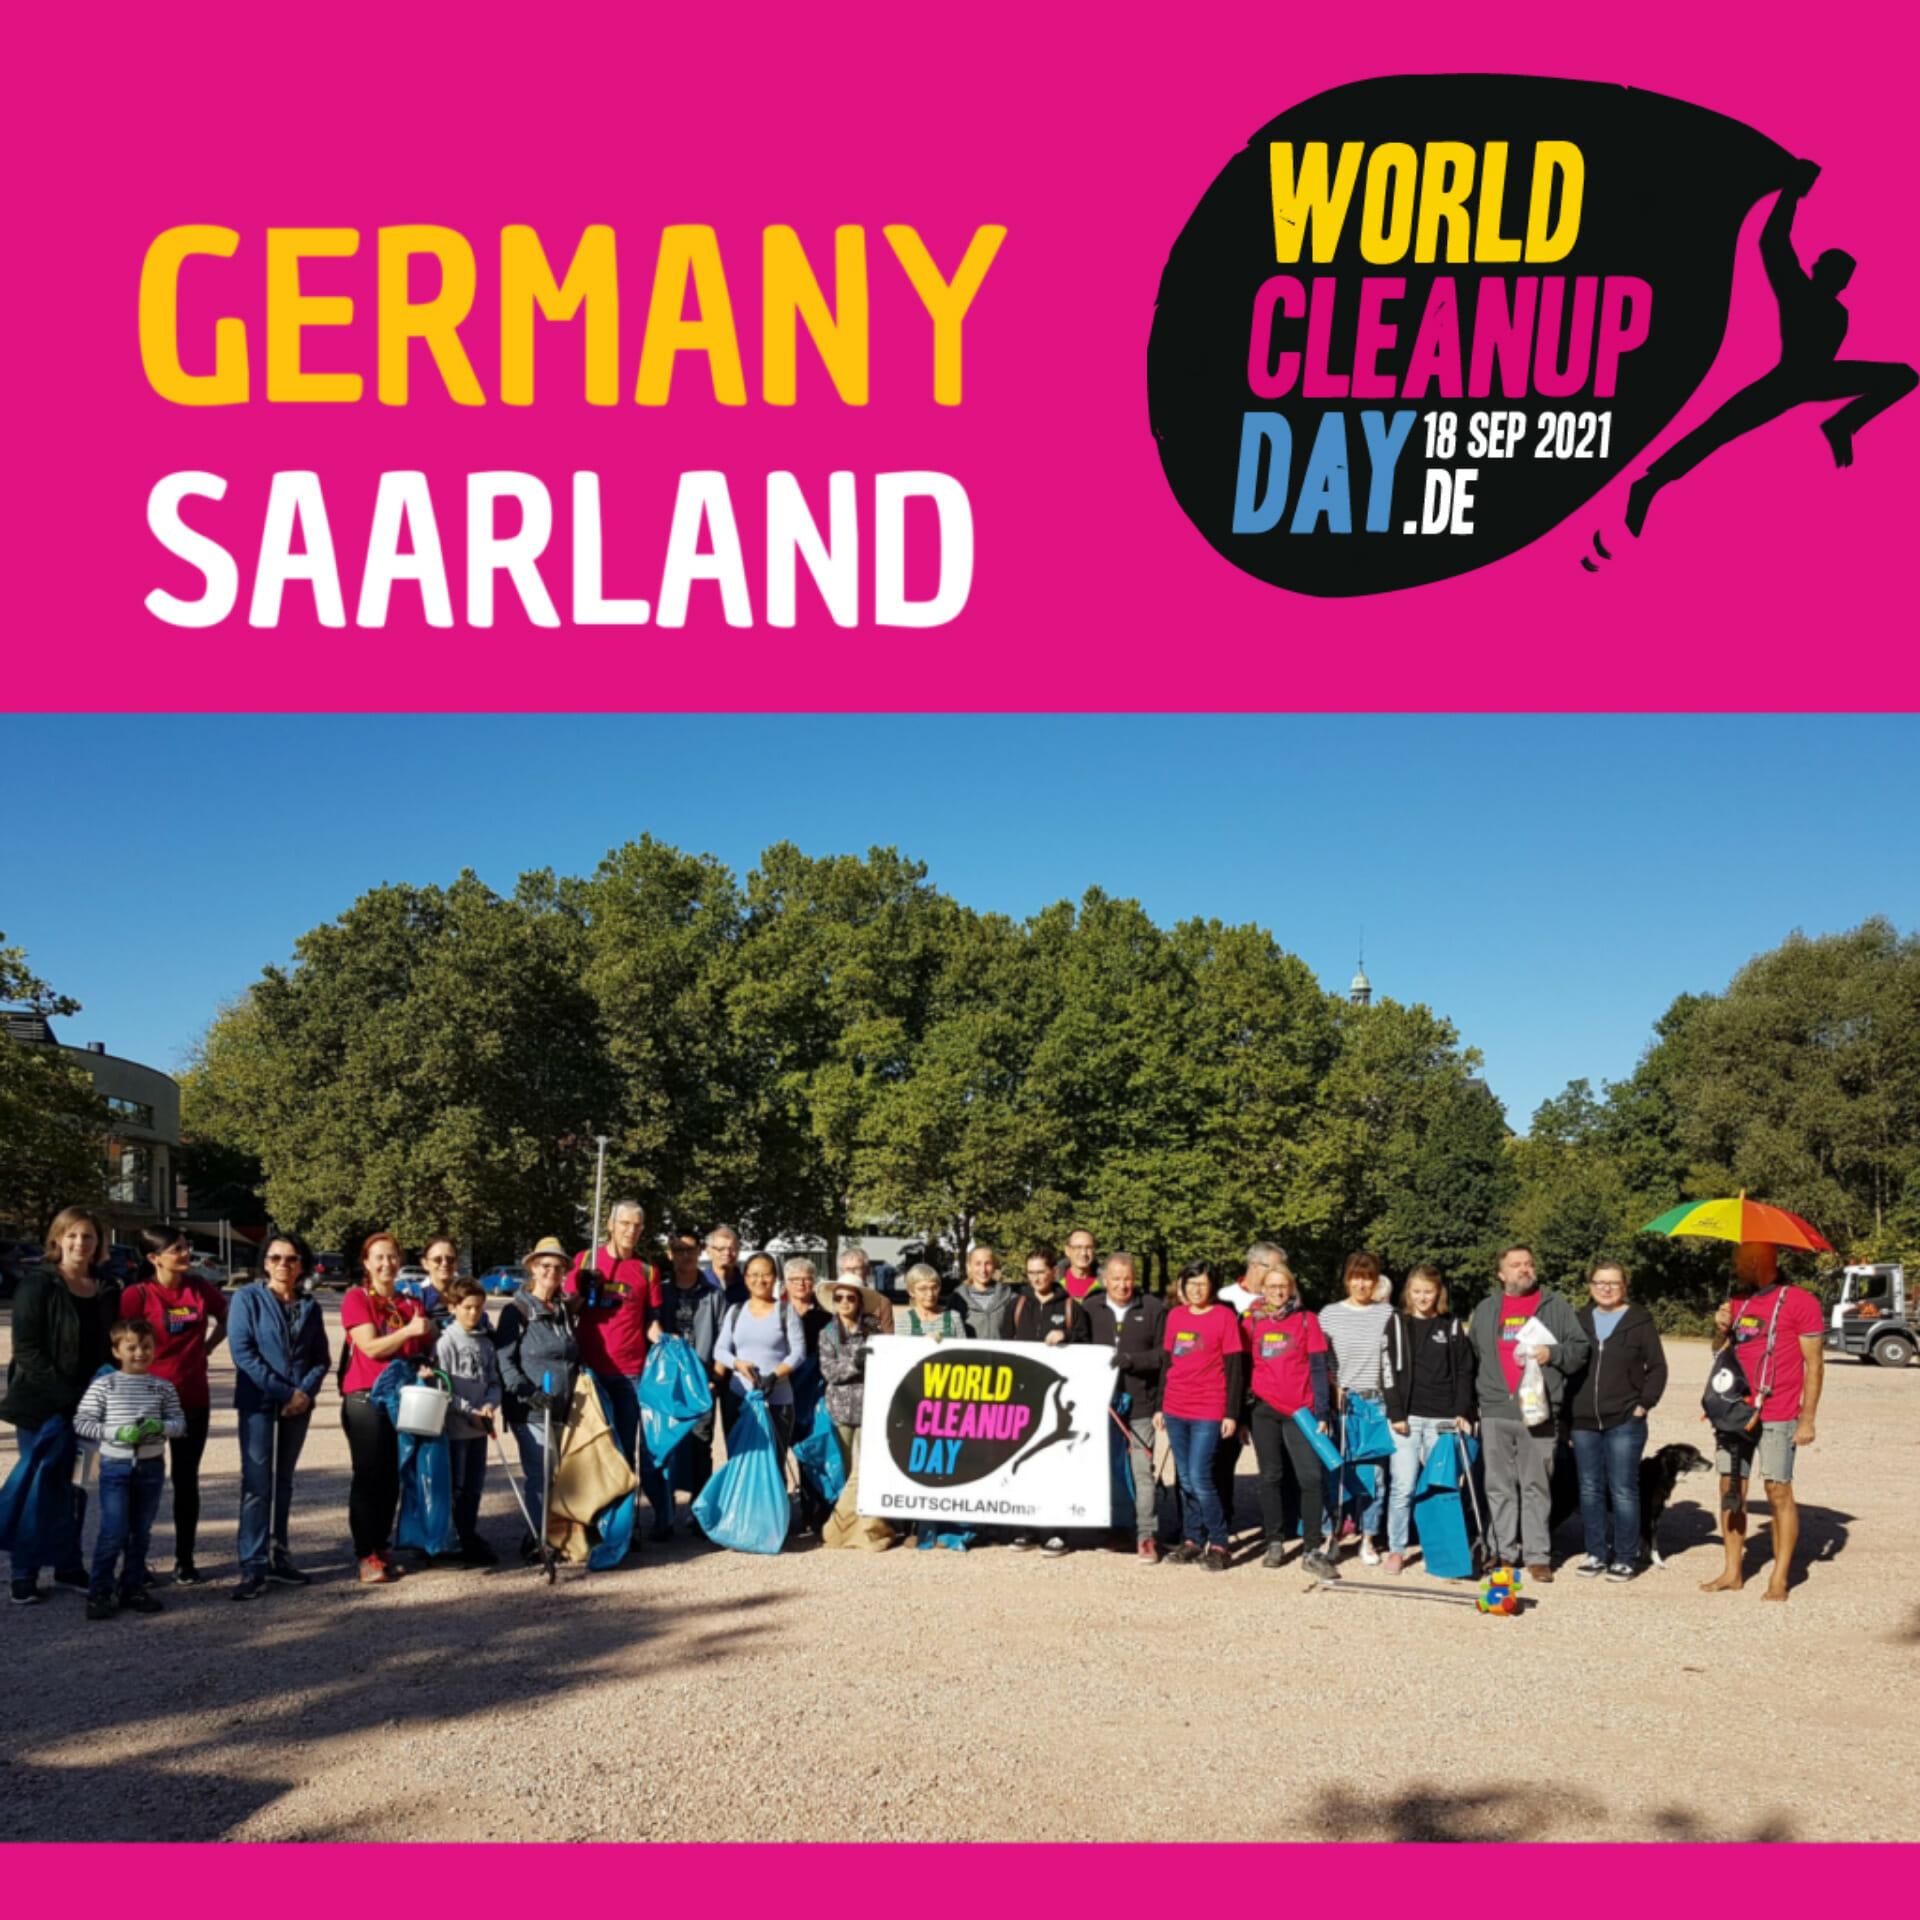 Clean up Karlsbrunn (Saarland)